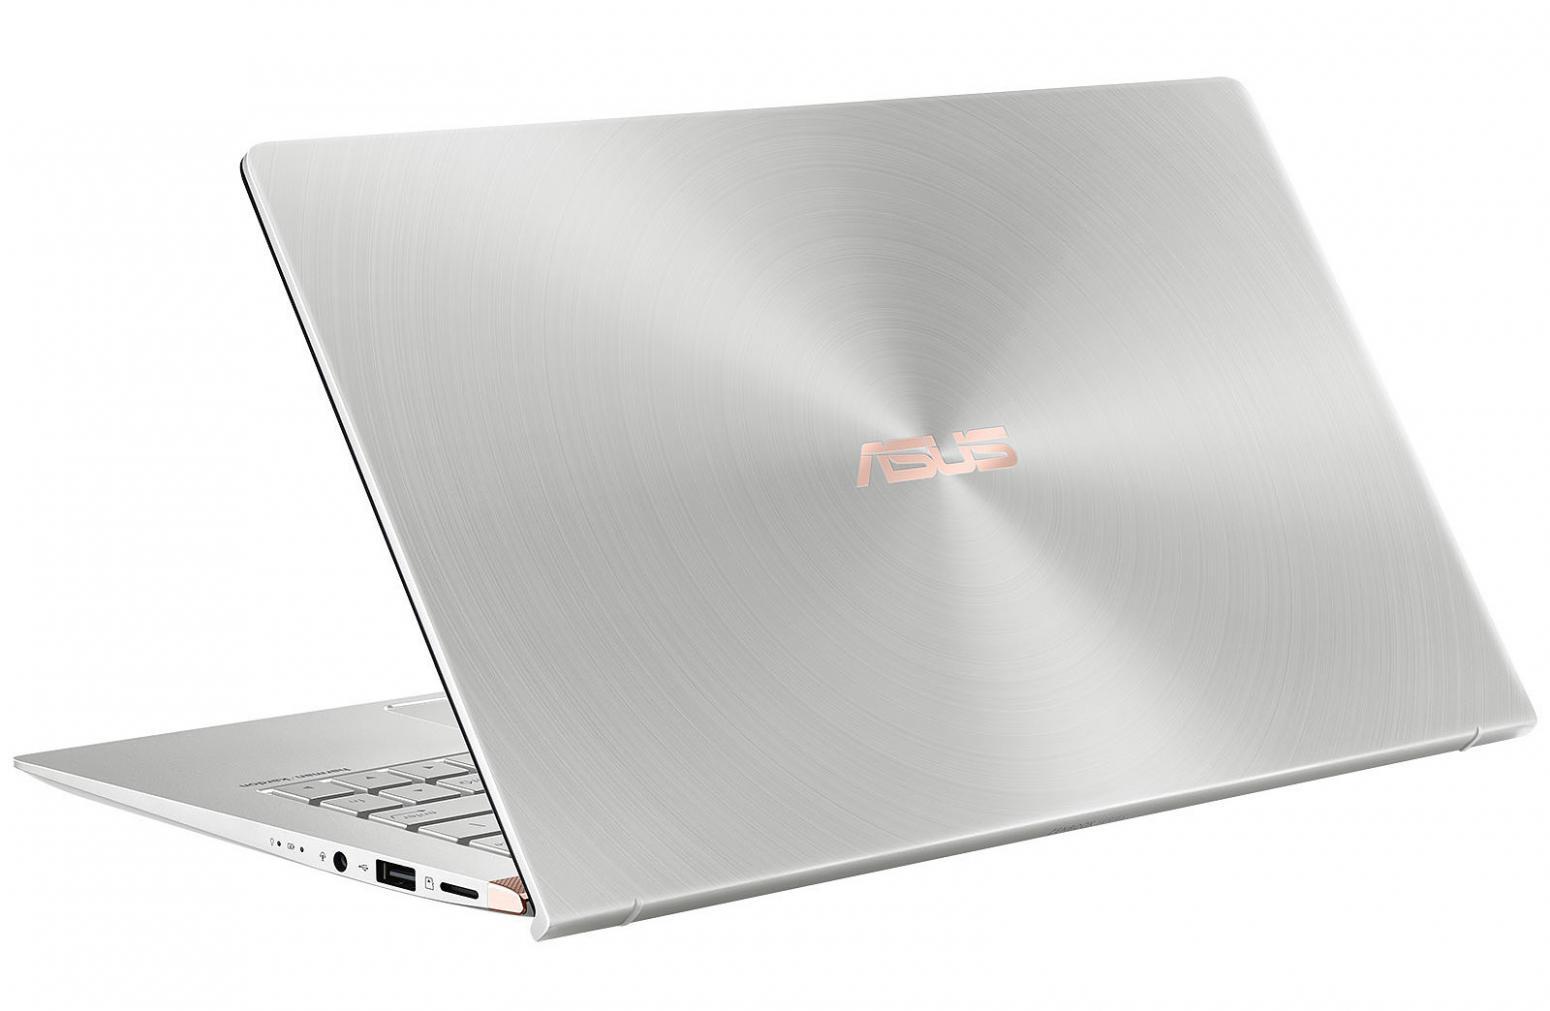 Ordinateur portable Asus Zenbook 13 UX333FA-A3238R Argent - NumPad, Pro - photo 5